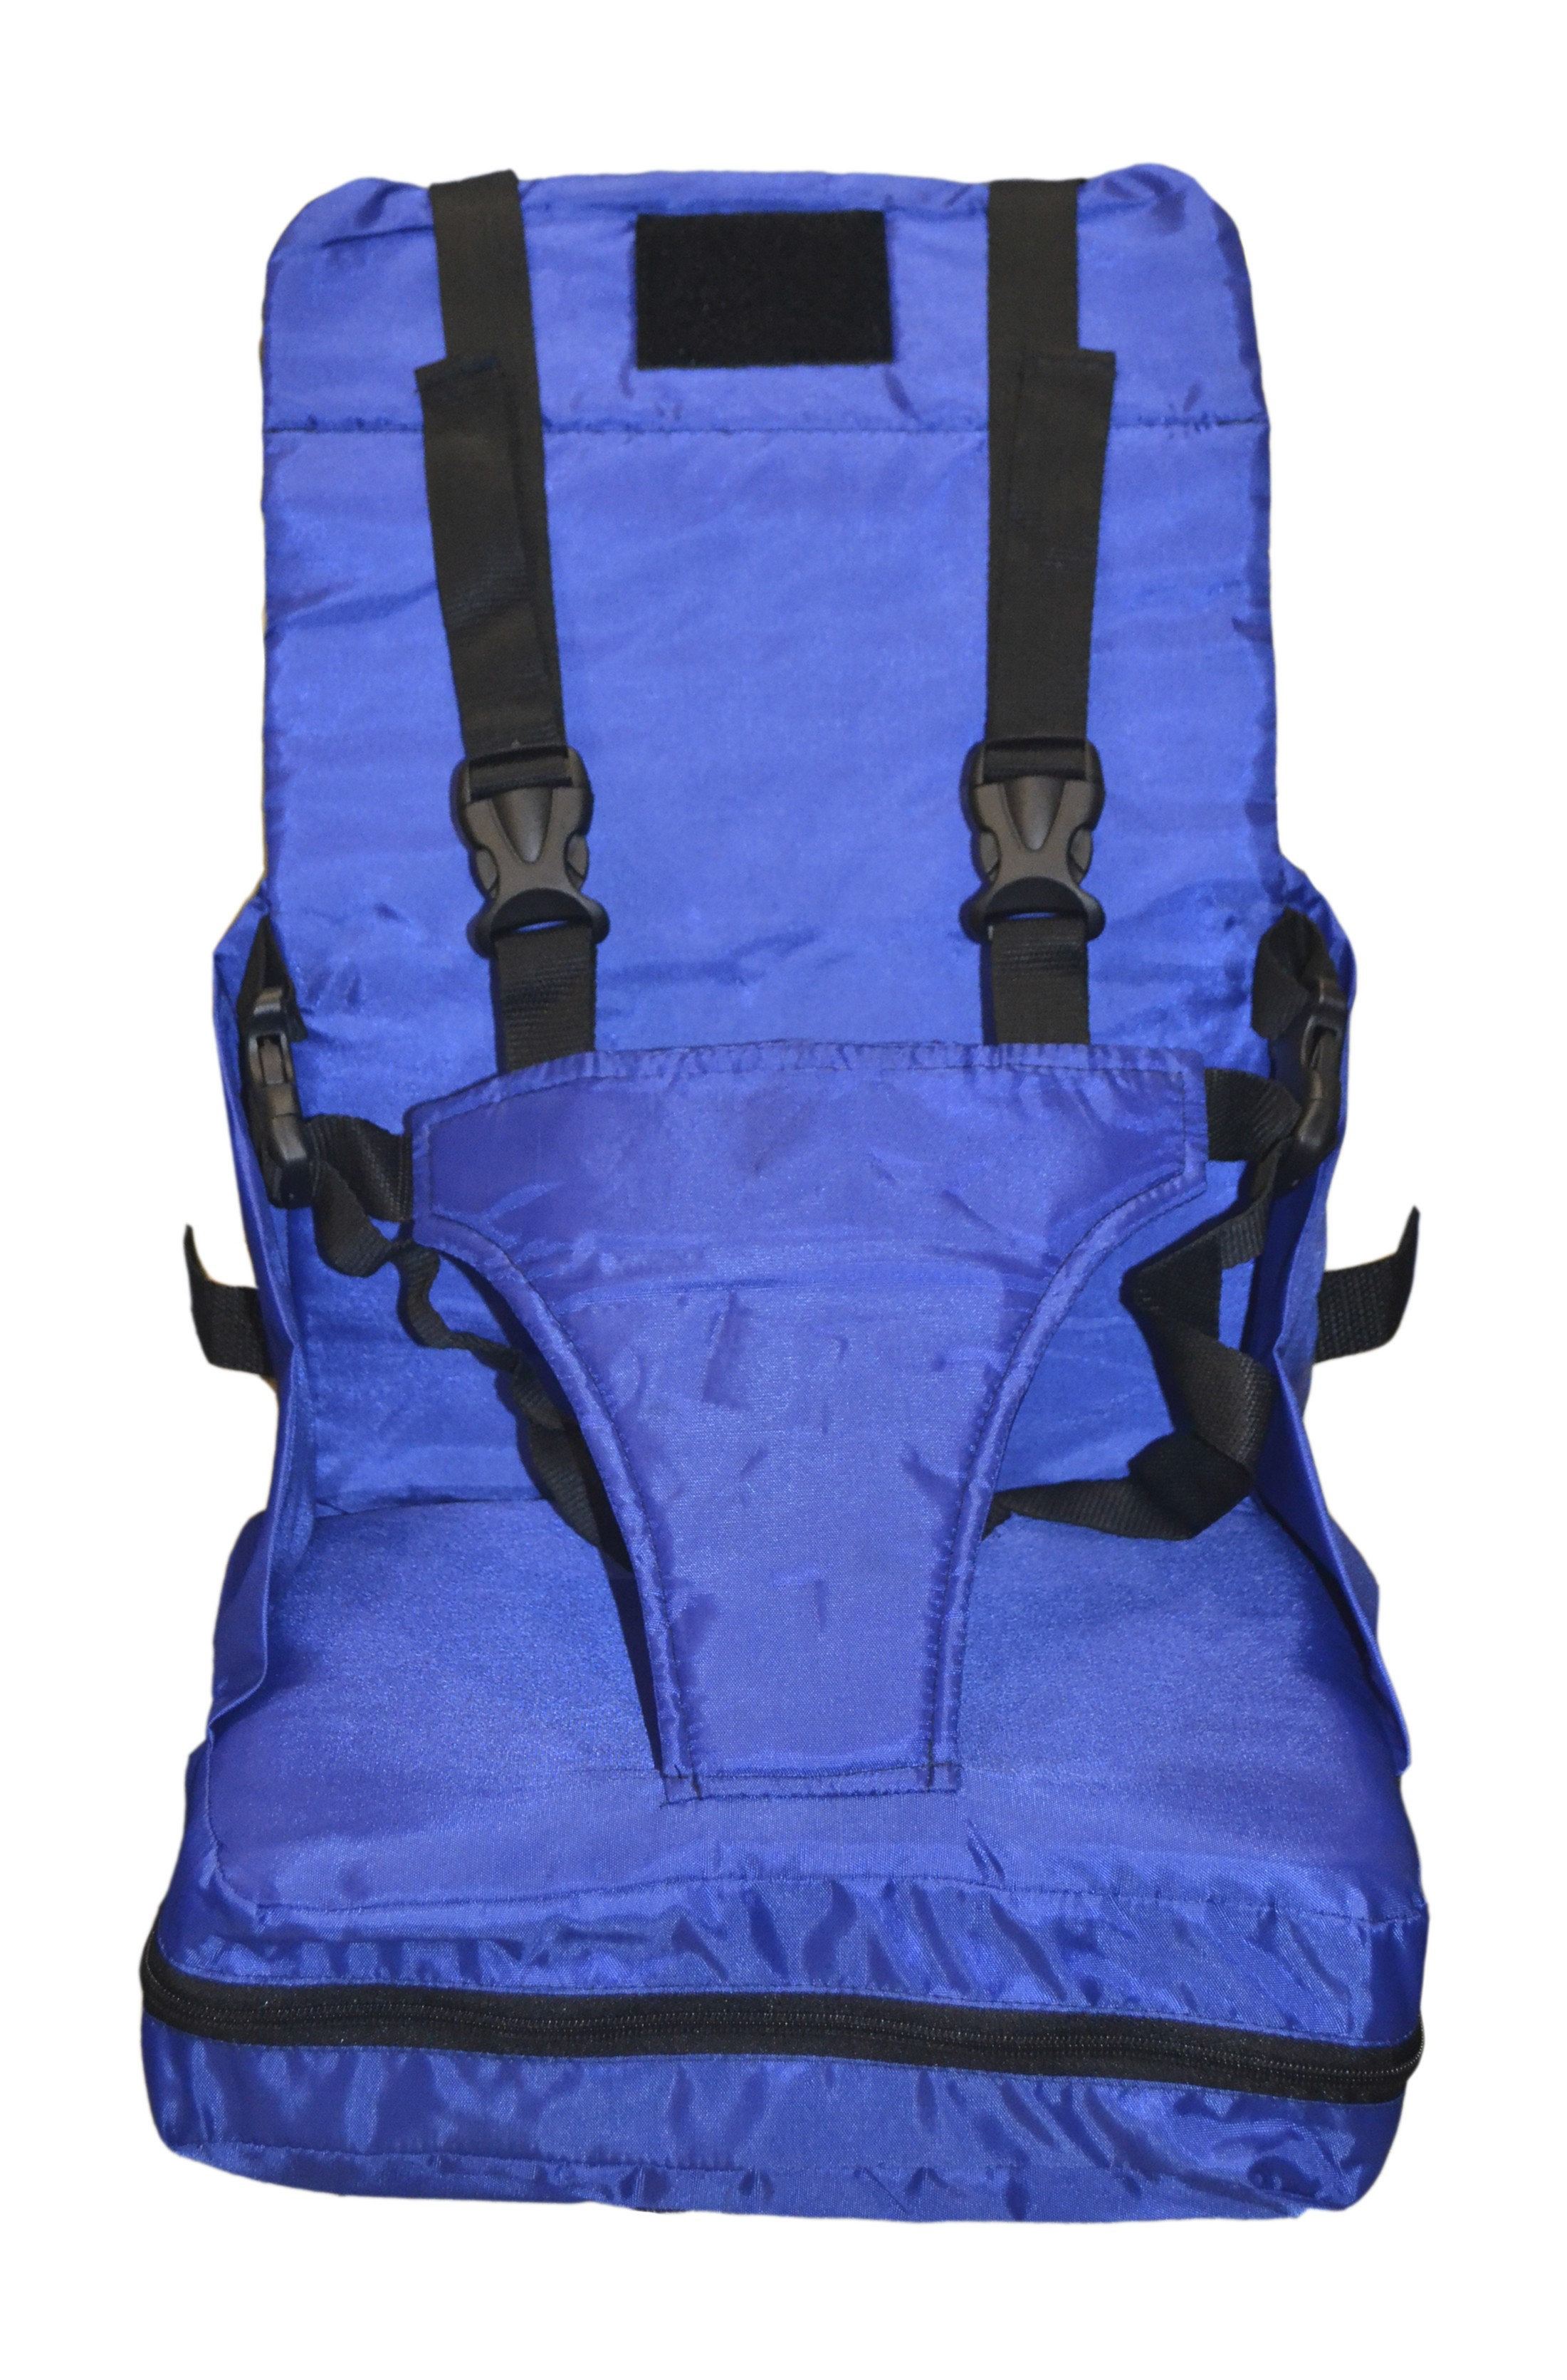 Стульчик для кормления Мирти Стульчик-бустер для кормления TravelSeat синий цена